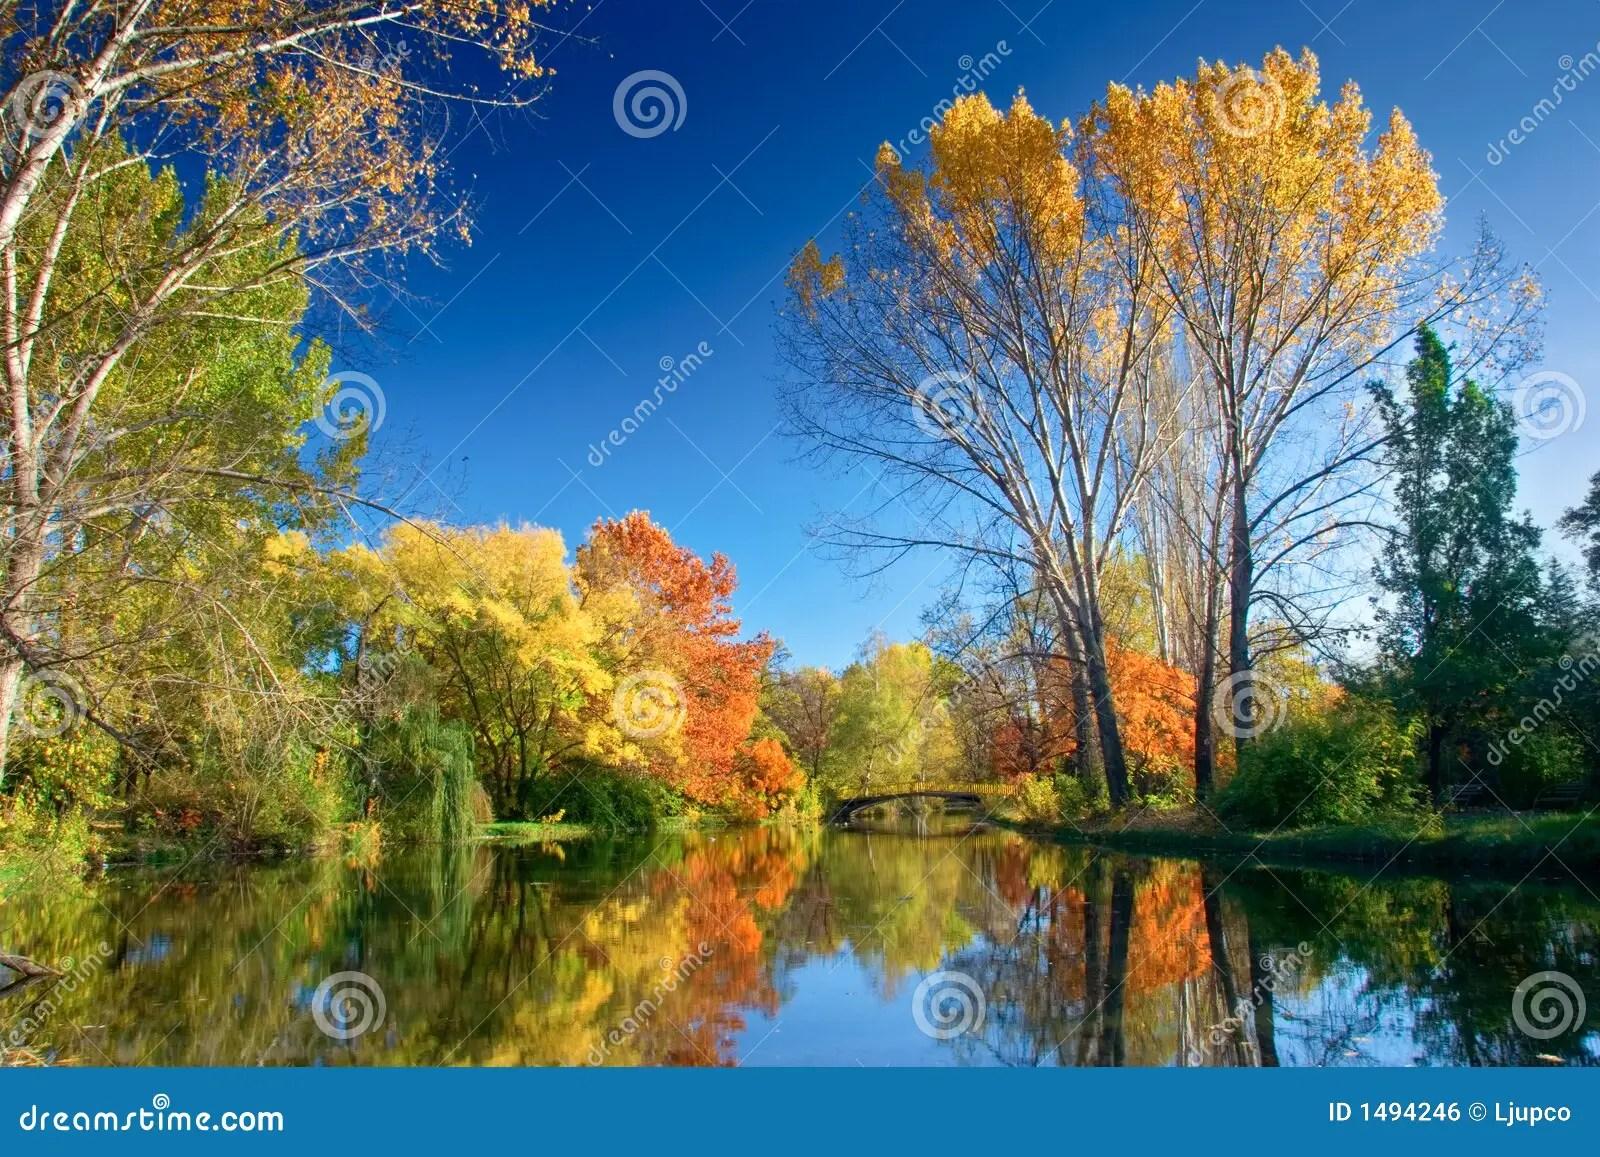 Birch Tree Fall Wallpaper Fall Landscape Royalty Free Stock Image Image 1494246